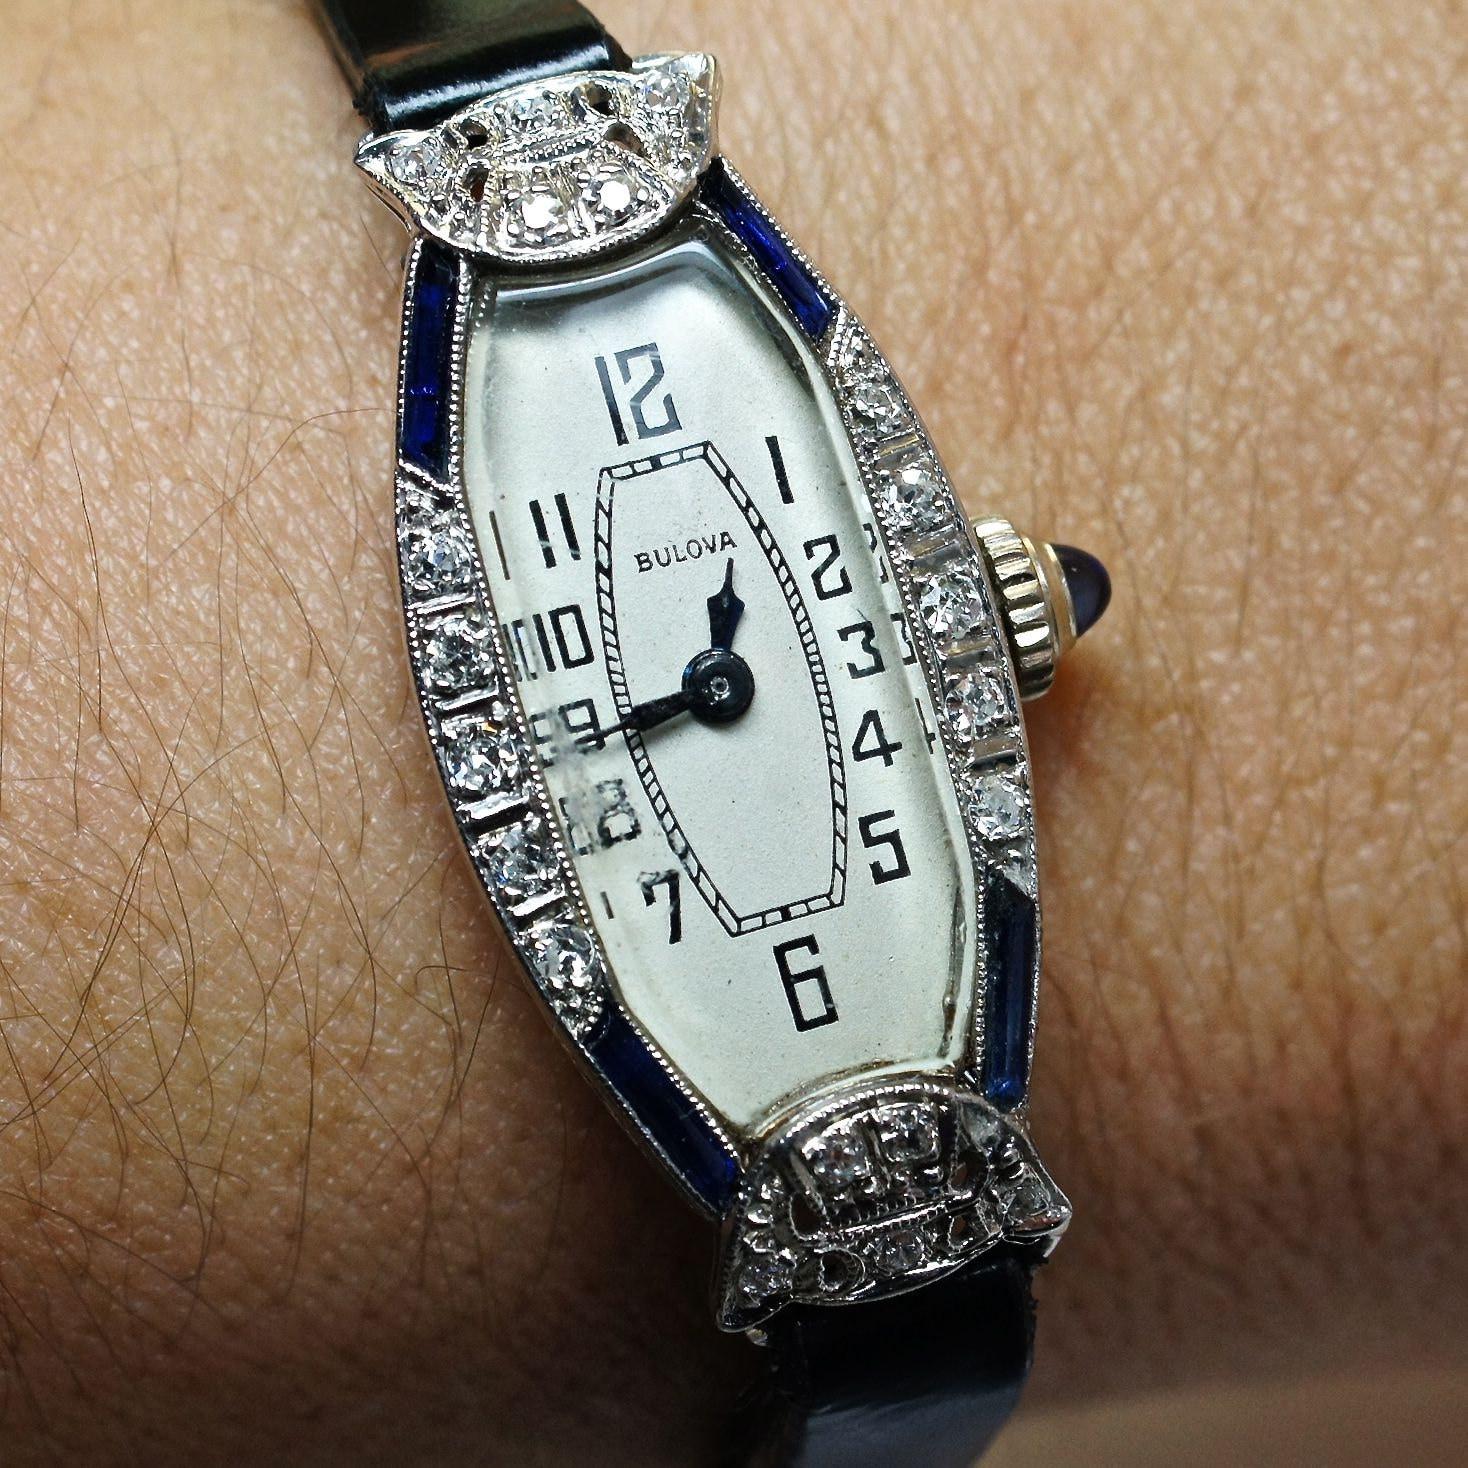 Vintage Ladies Platinum Bulova Watch with Diamonds and